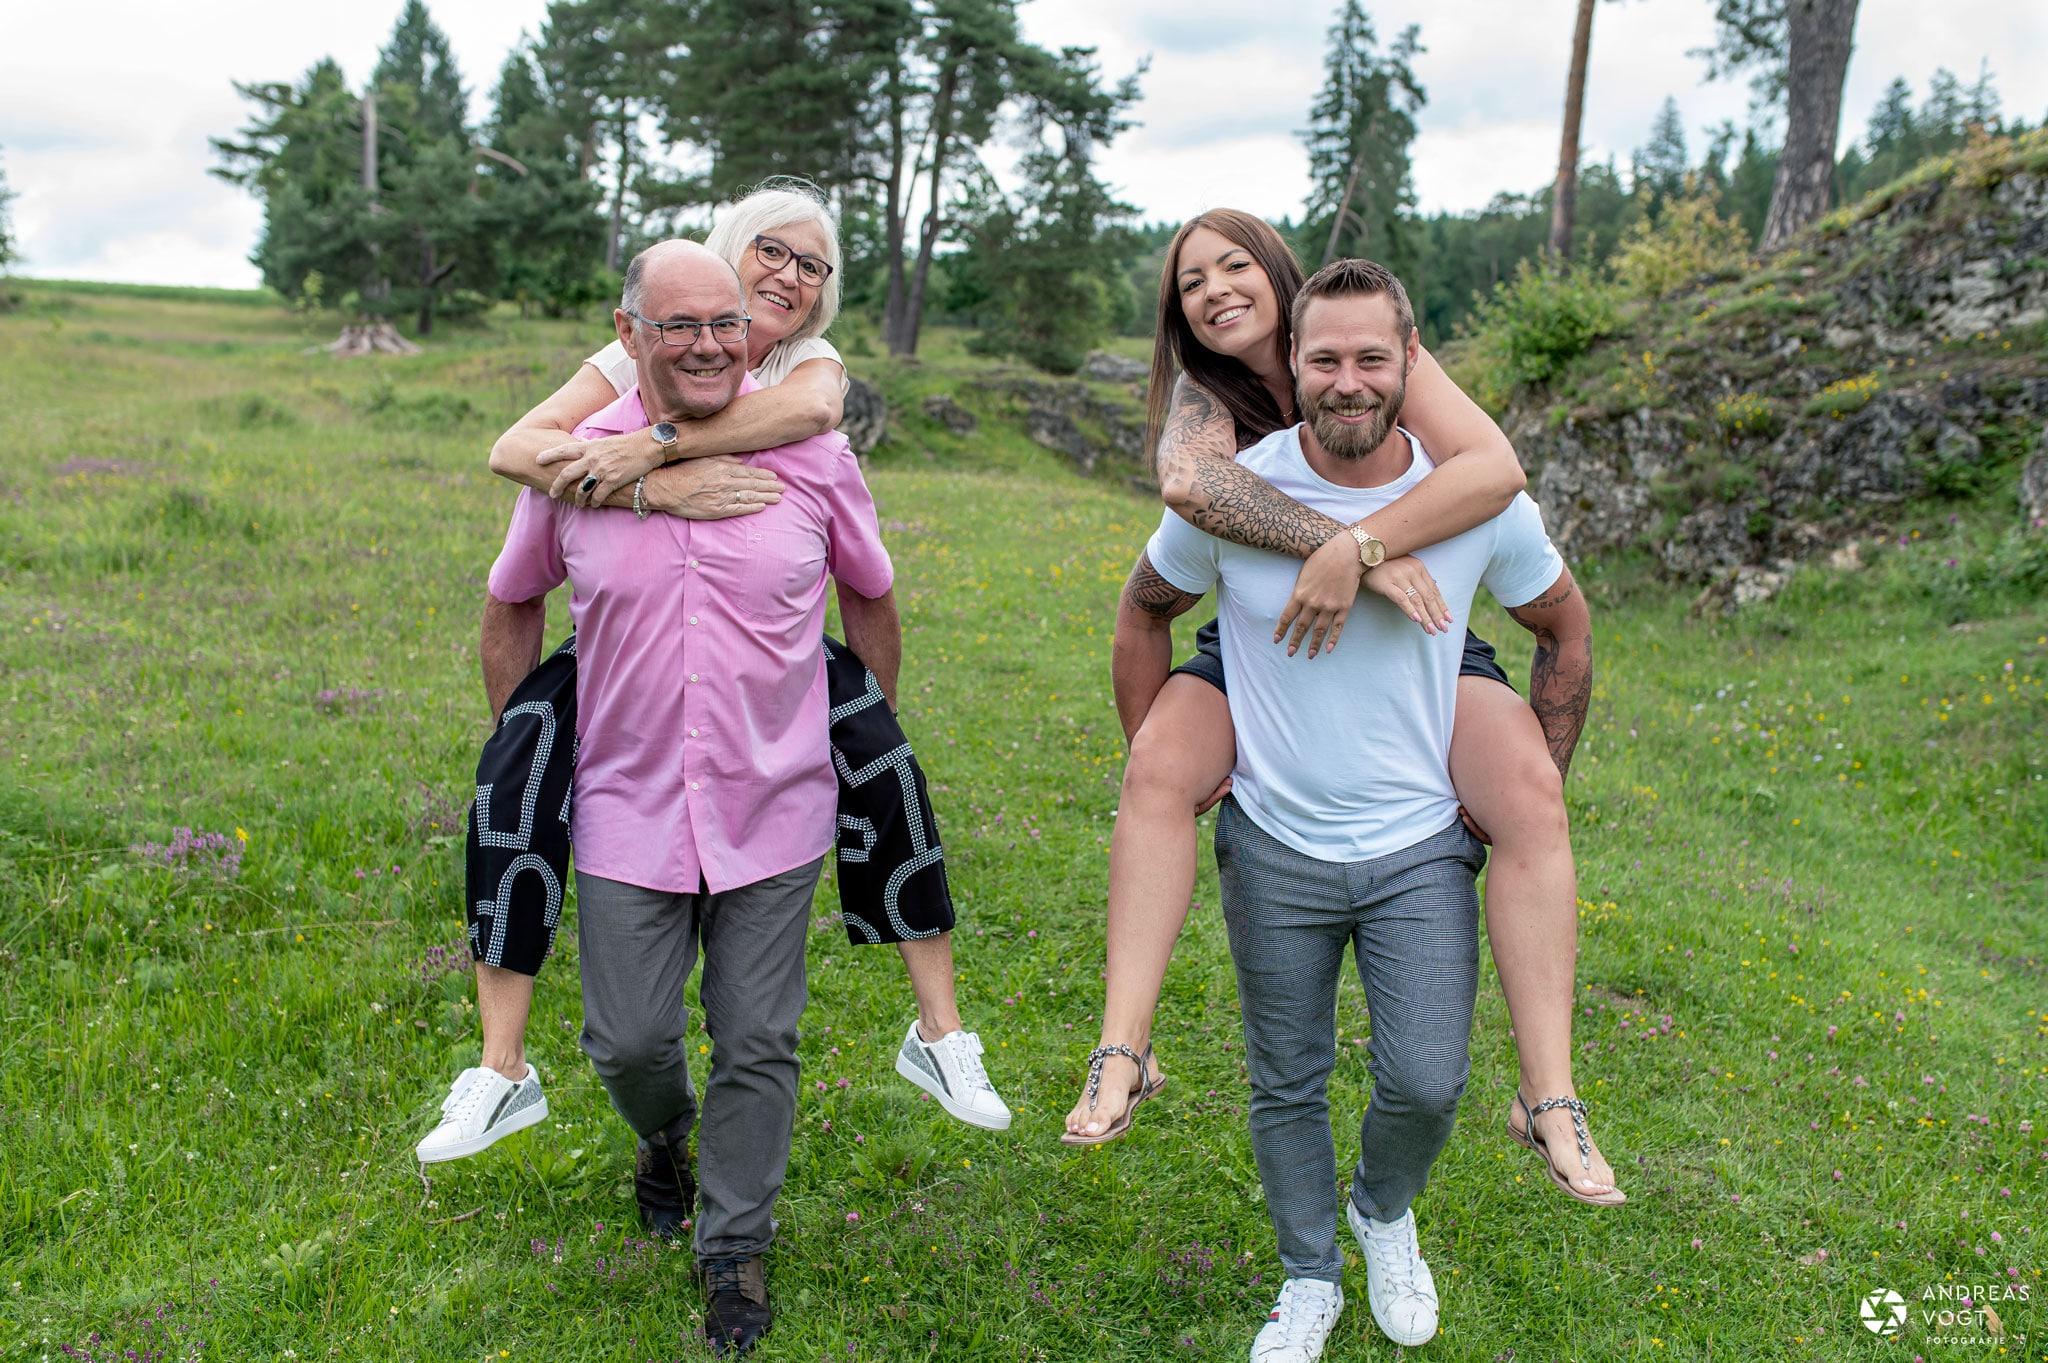 Familienfotos im Wental 04 - Fotograf Andreas Vogt aus Aalen